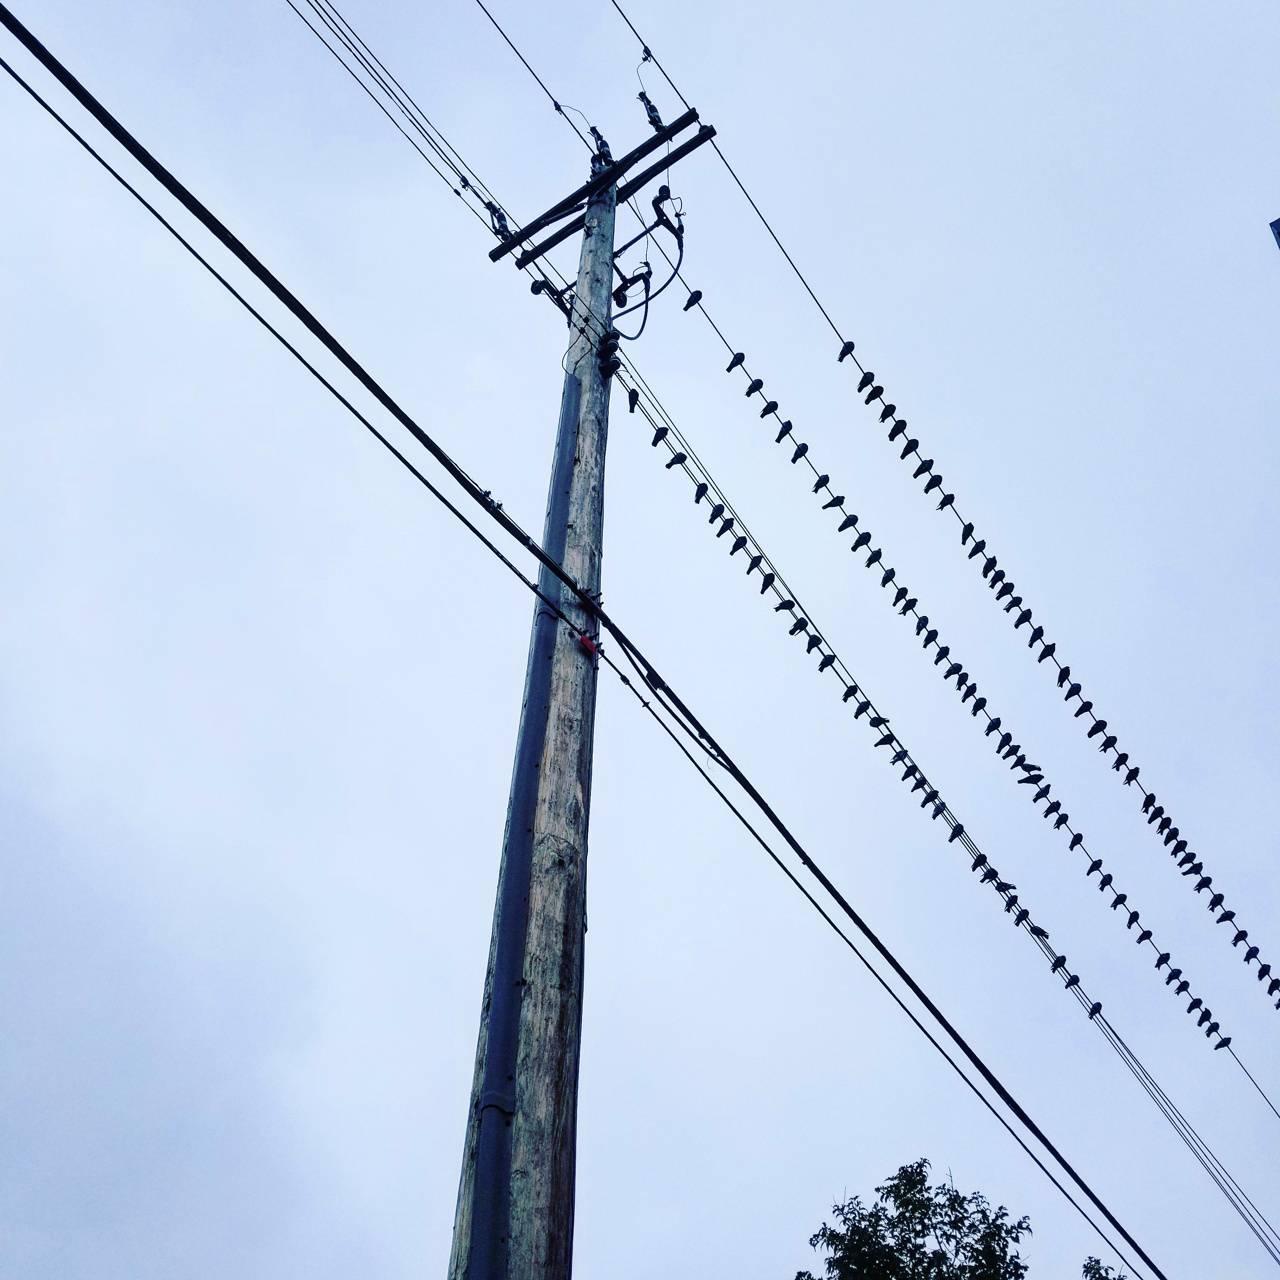 Birds On A Wire Wallpaper By Spschultz78 Ee Free On Zedge